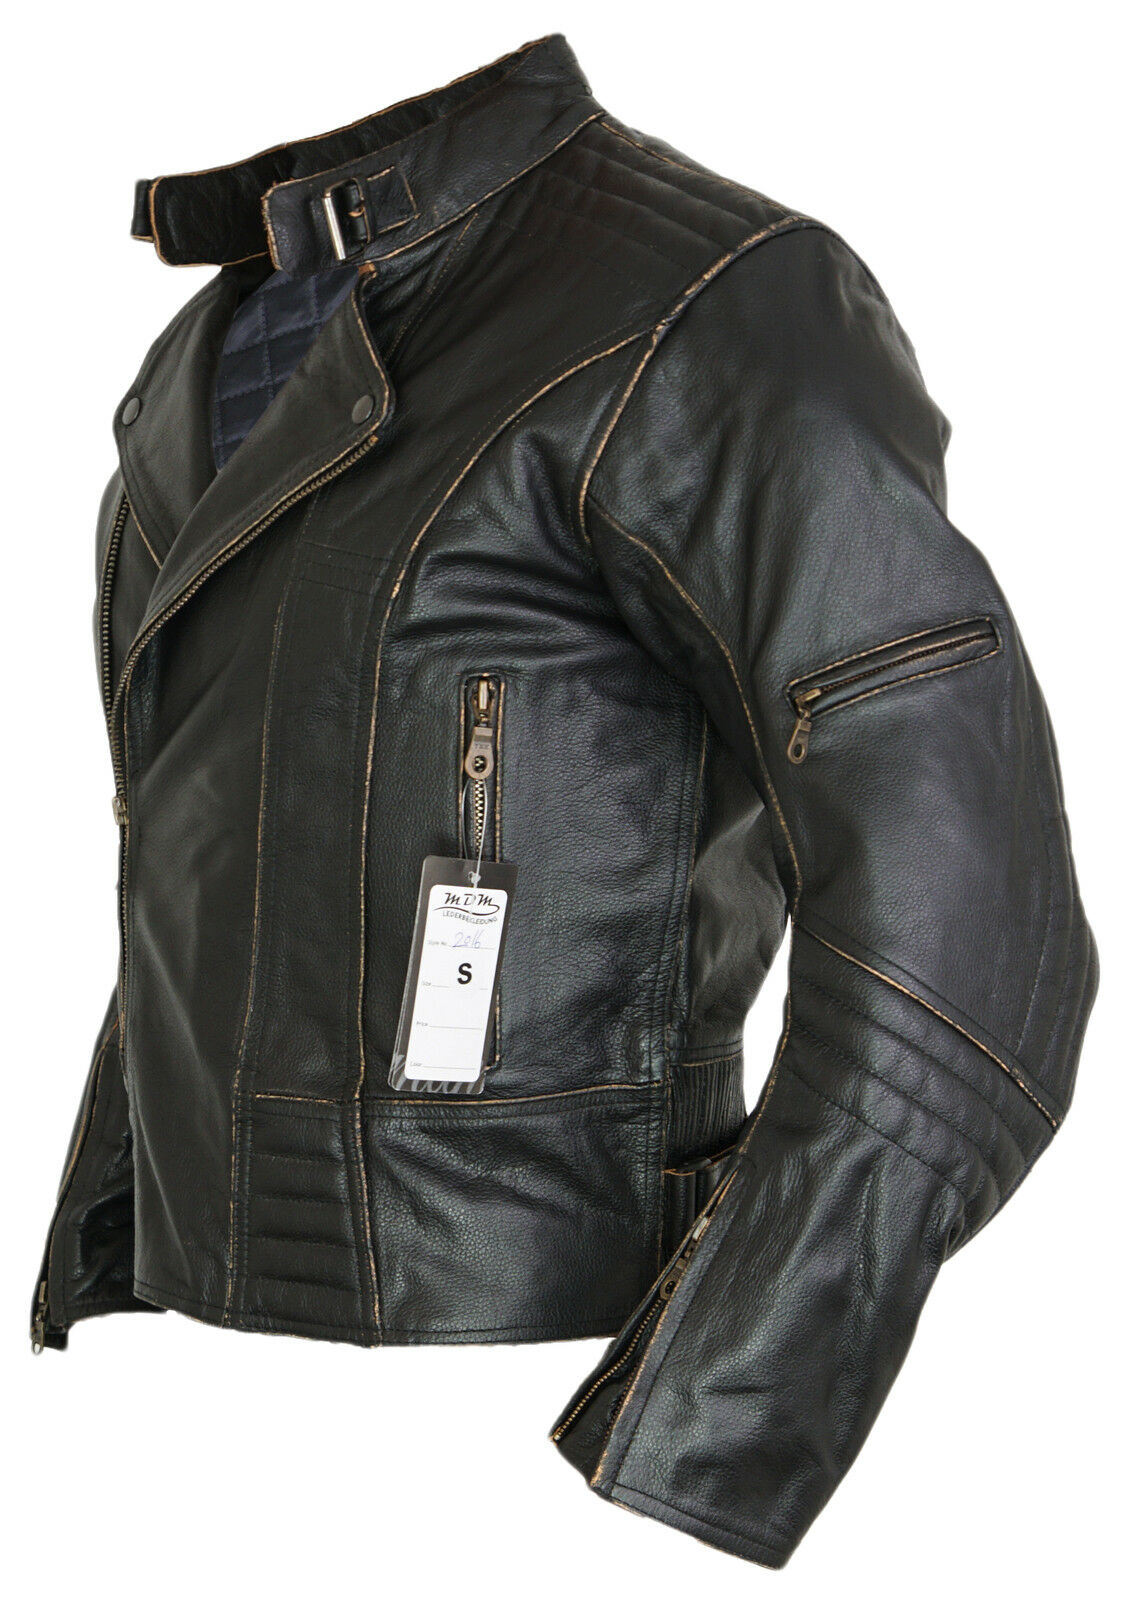 herren motorrad lederjacke biker retro rocker chopper. Black Bedroom Furniture Sets. Home Design Ideas